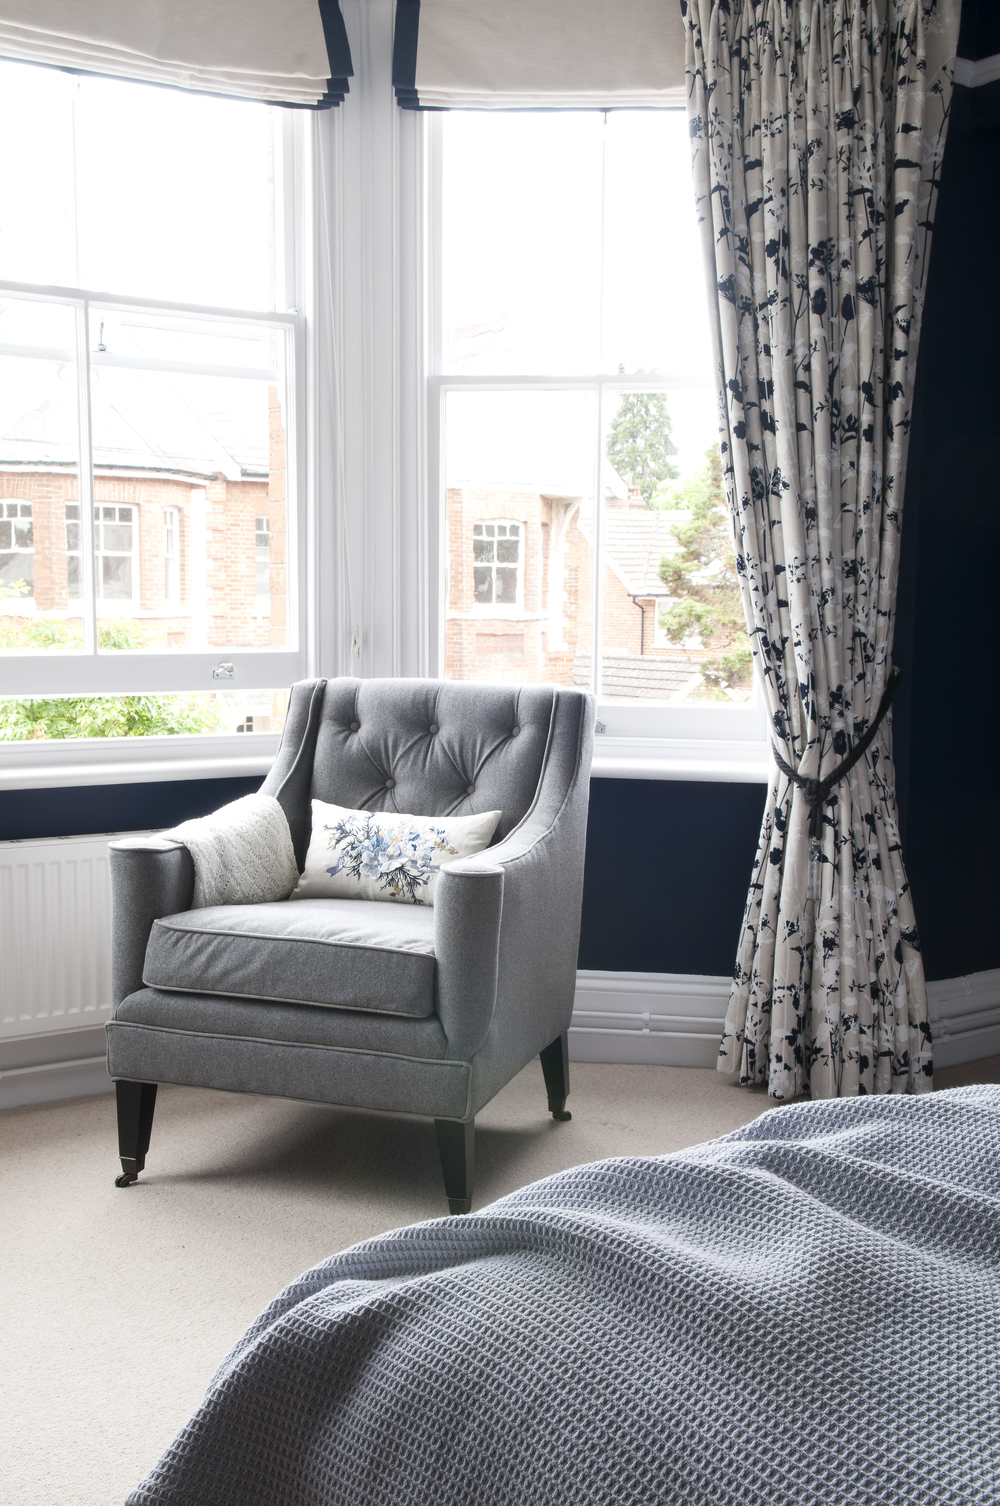 Tunbridge Wells Master Bedroom Design by Smartstyle Interiors – Sitting Area.jpg